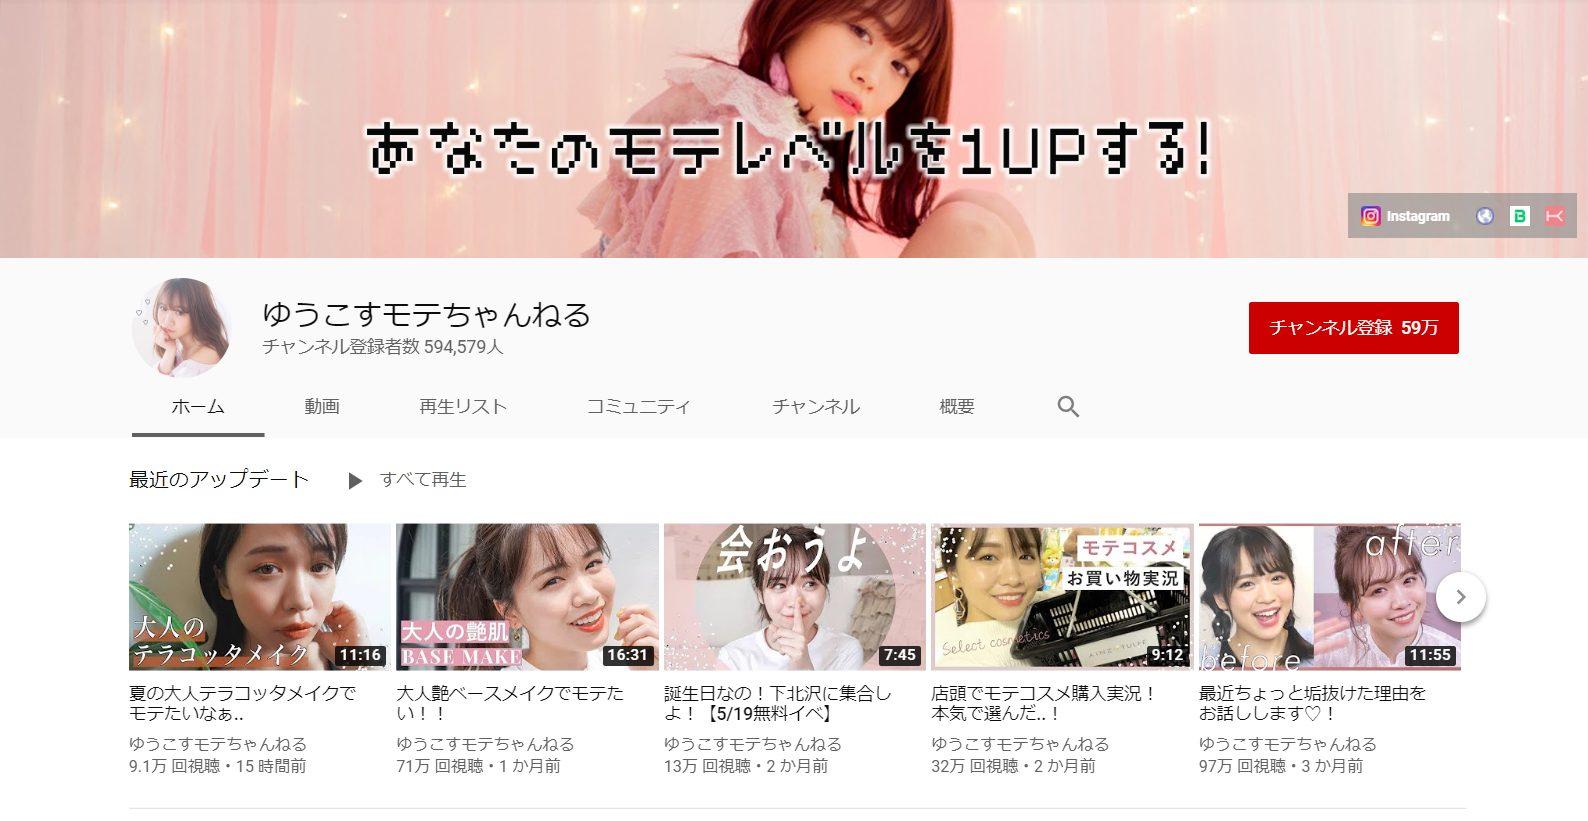 beauty-cosmetic-youtube-channel-yuukosu